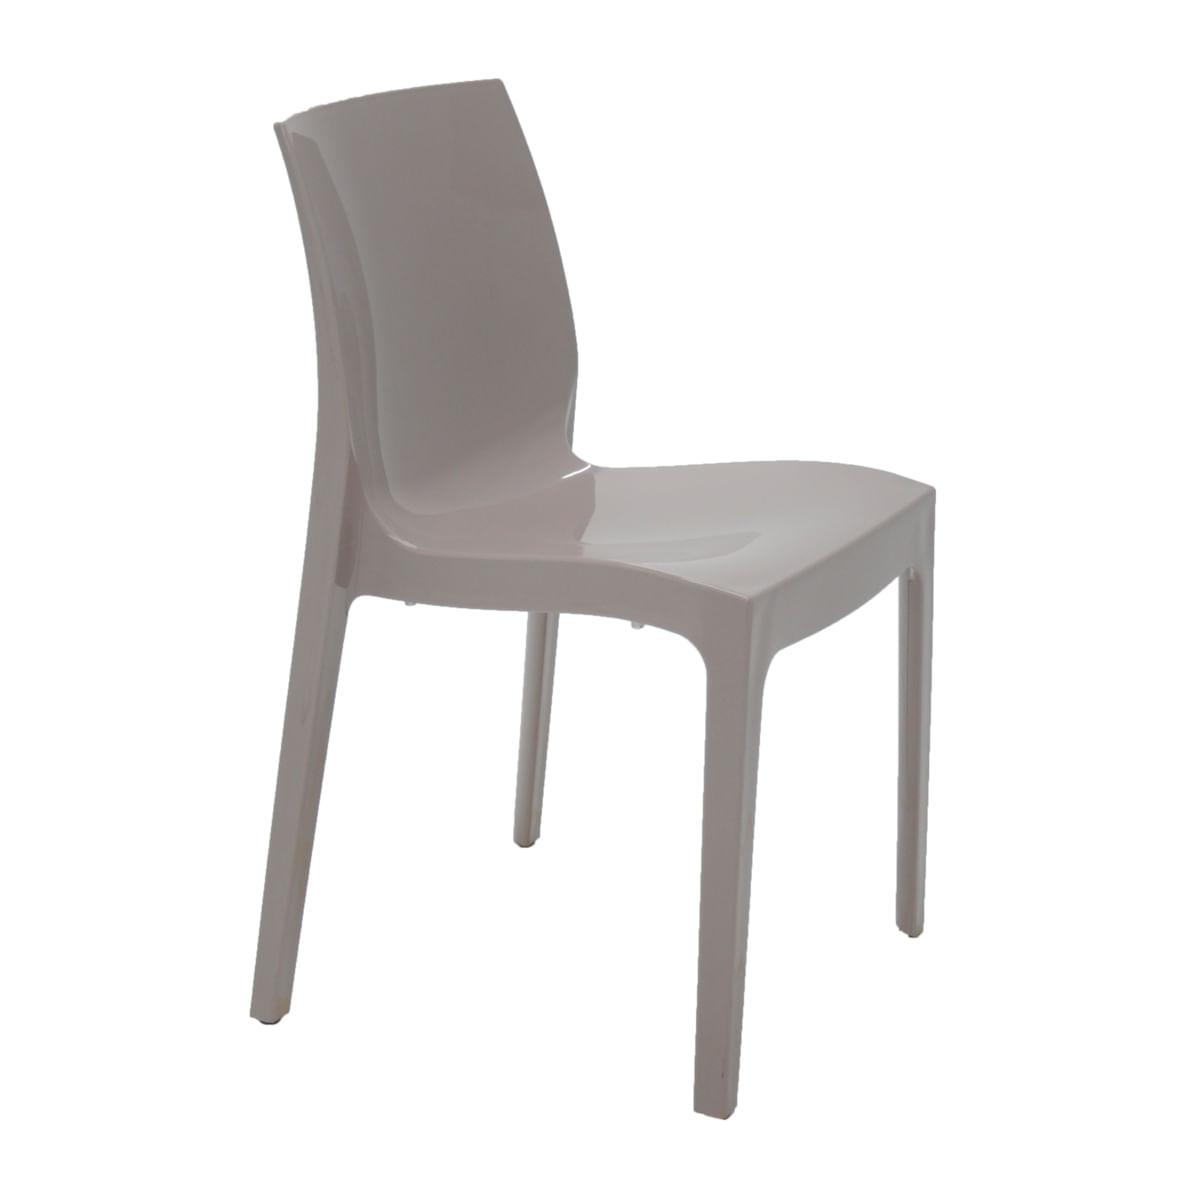 Cadeira Tramontina Alice Polida em Polipropileno Camurça